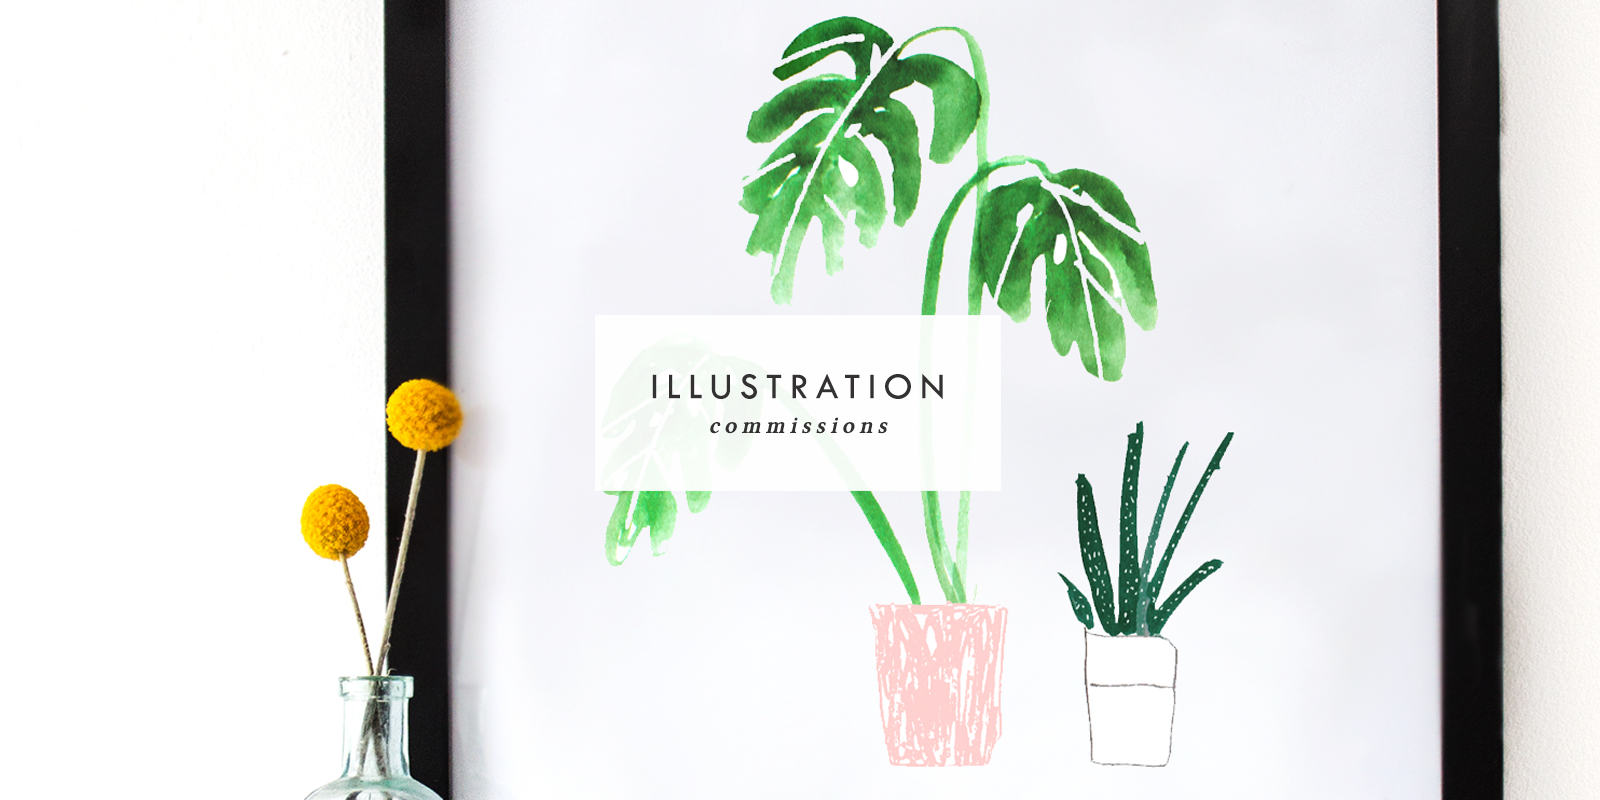 illustration commissions